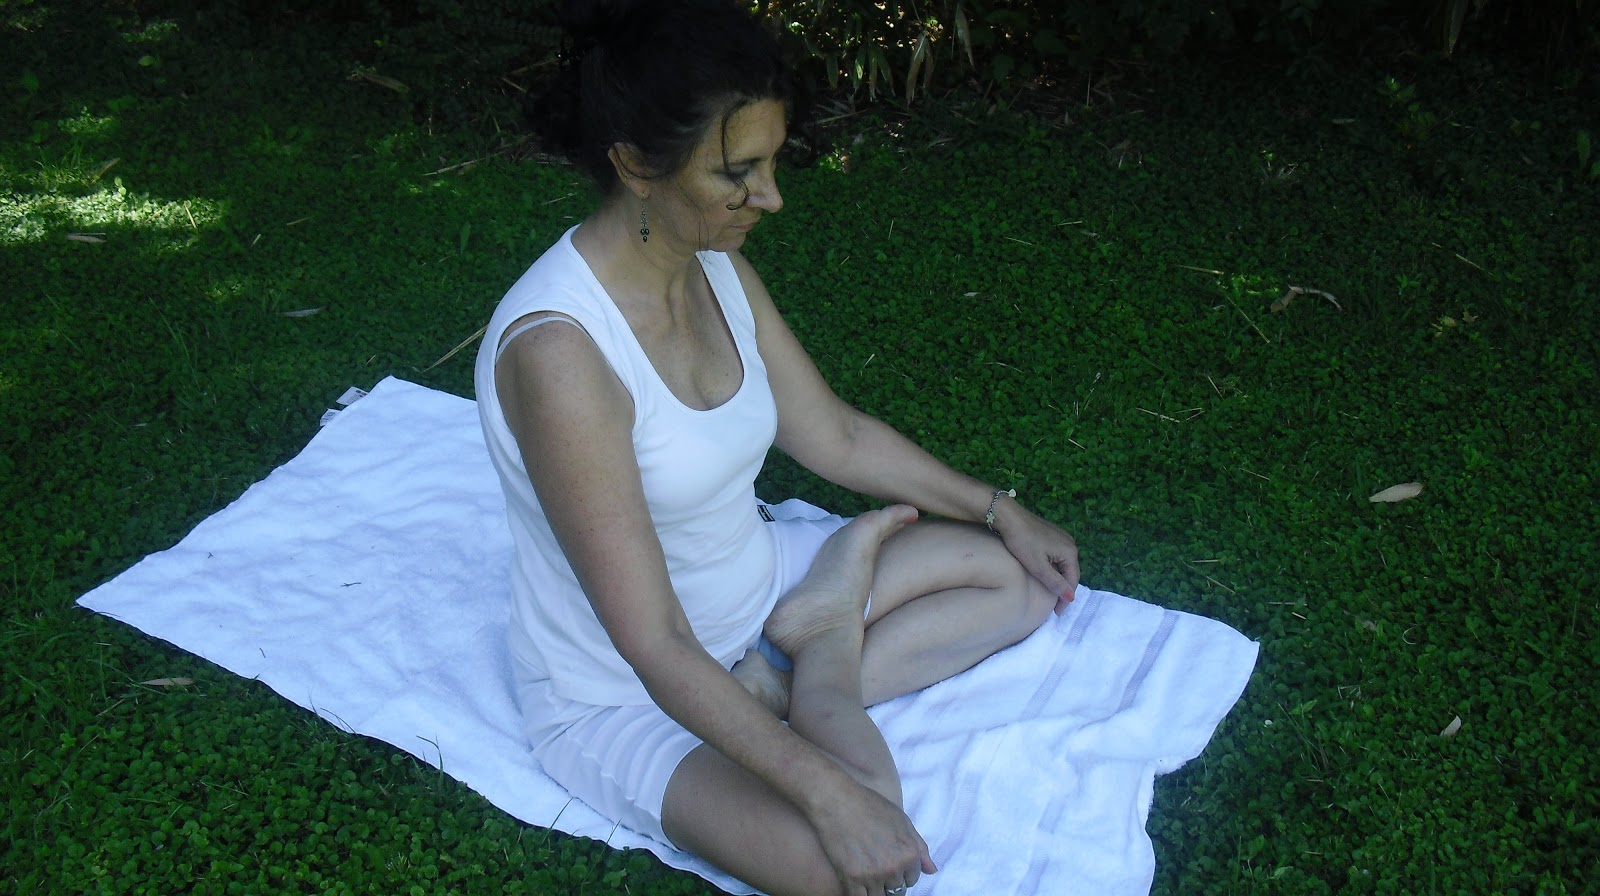 Mejor Persona | Mercedes Beatriz Azcarate. Profesora de Yoga